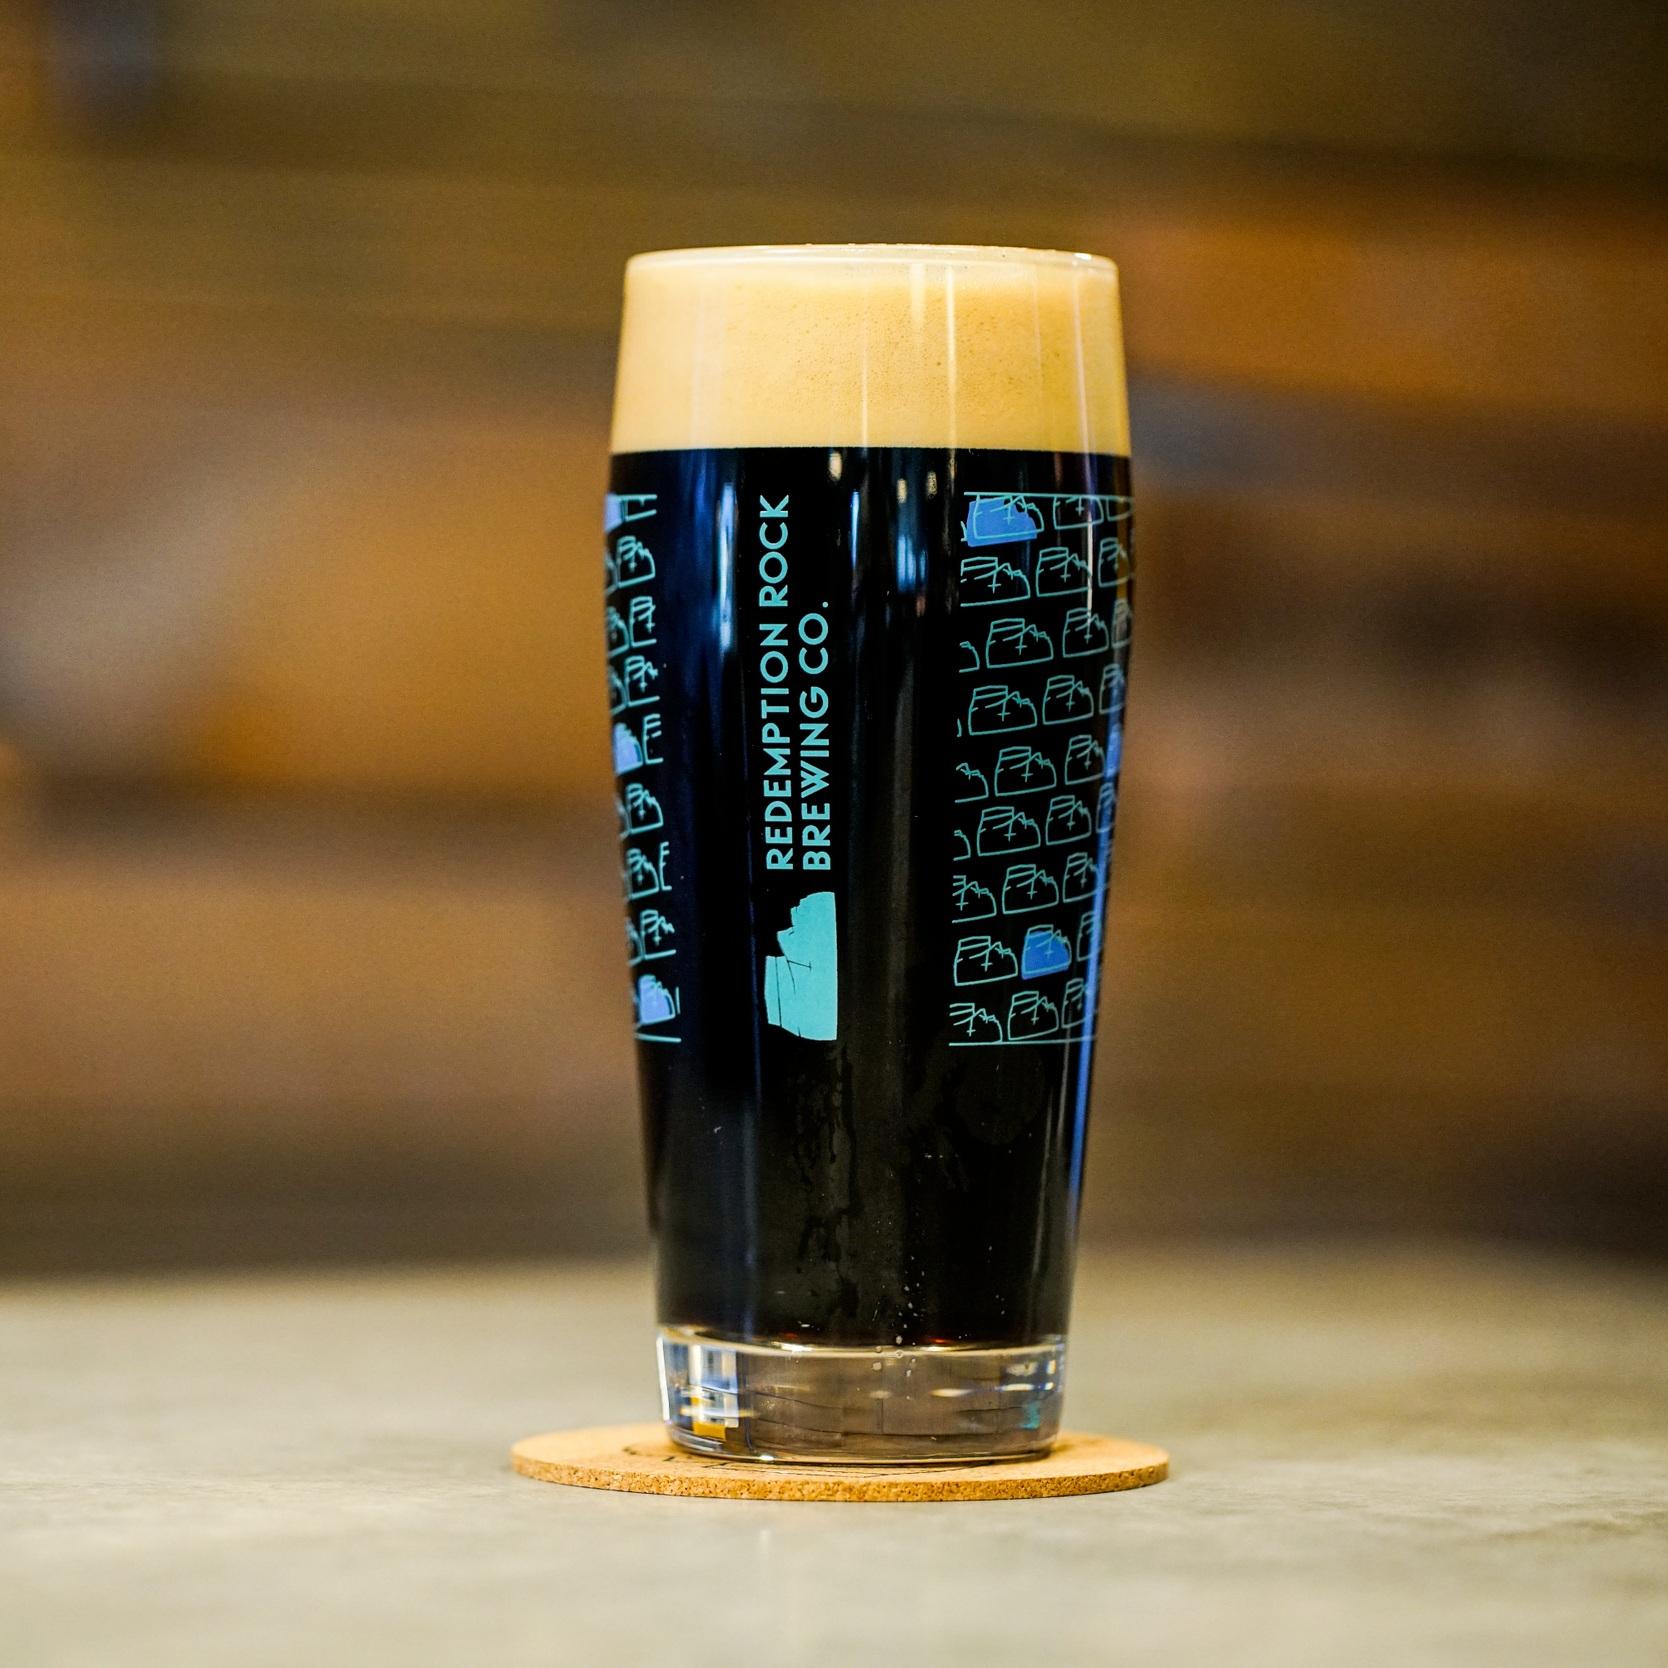 Blackstone+Irish+Dry+Stout+-+Redemption+Rock+Brewing+Co.jpg